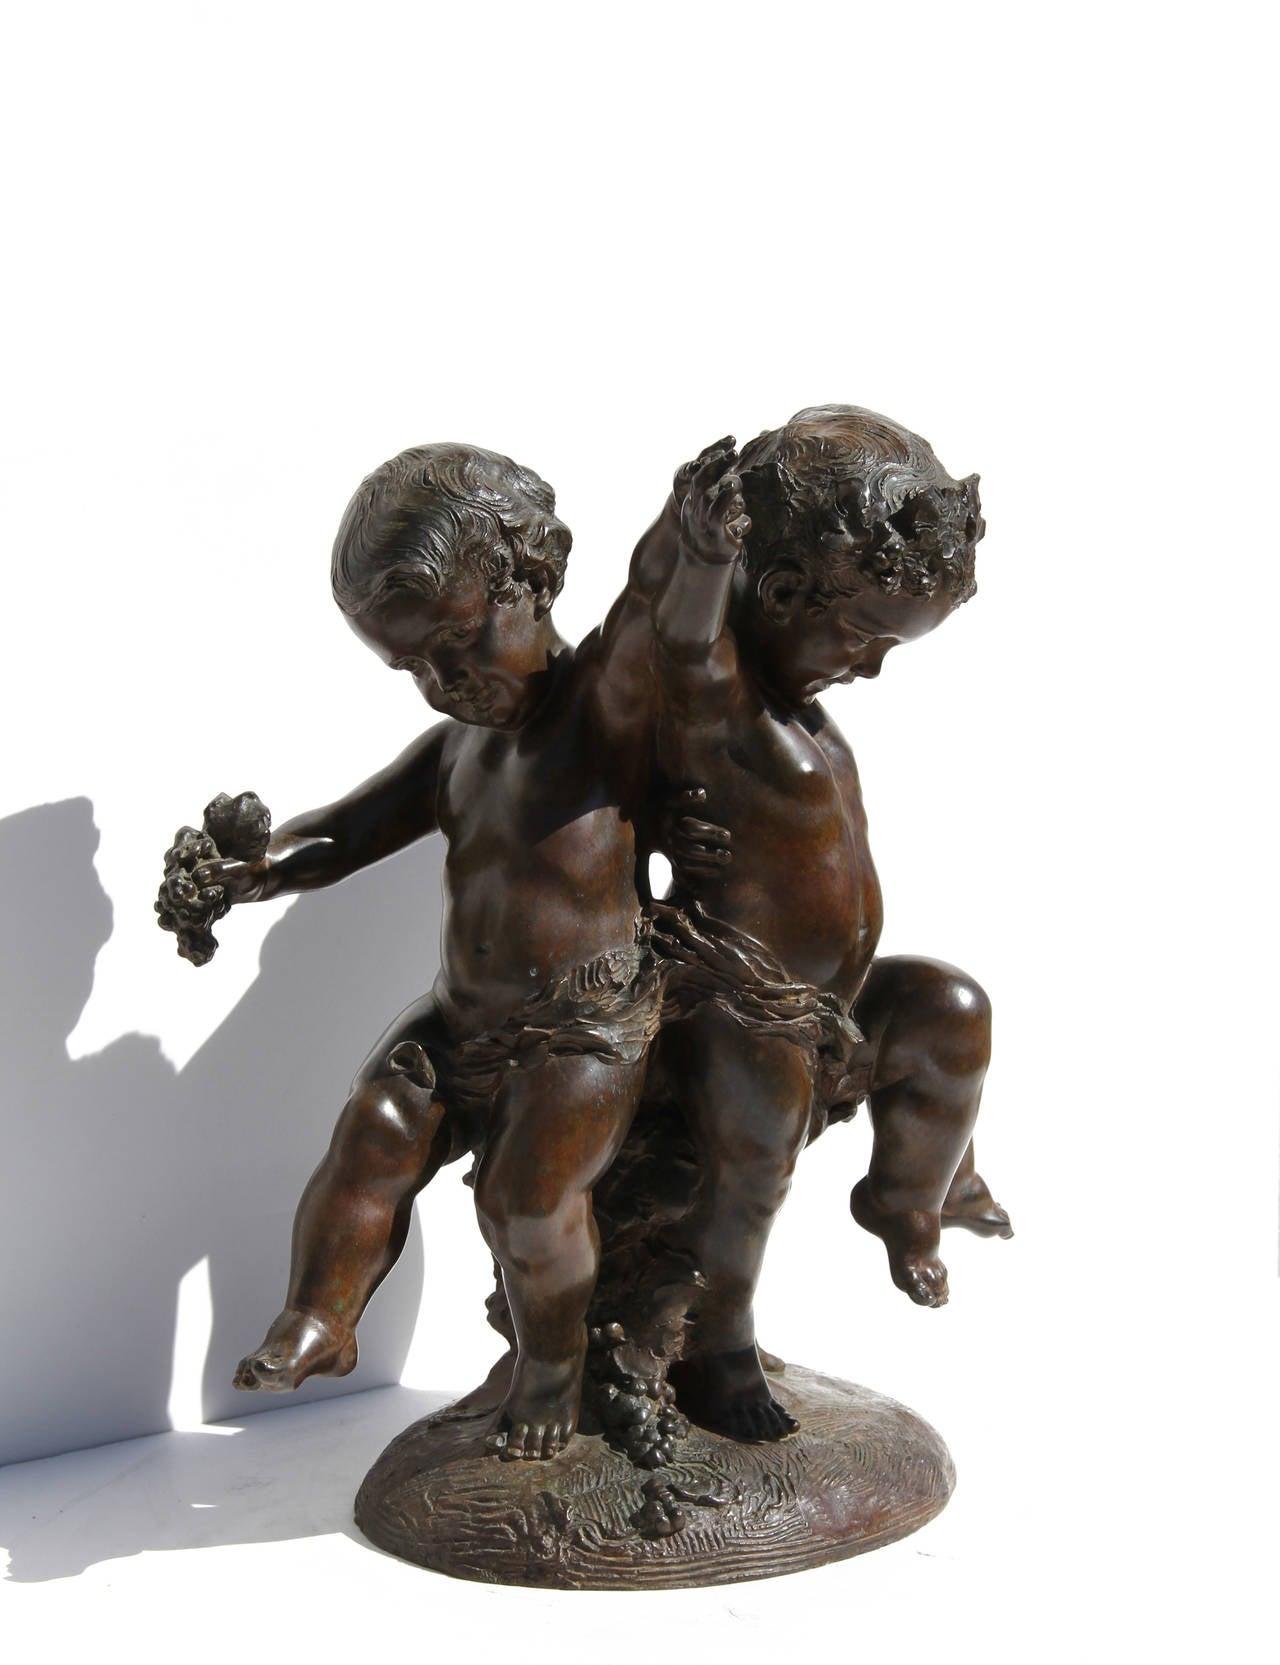 Three Putti - Sculpture by Affortunato Gory